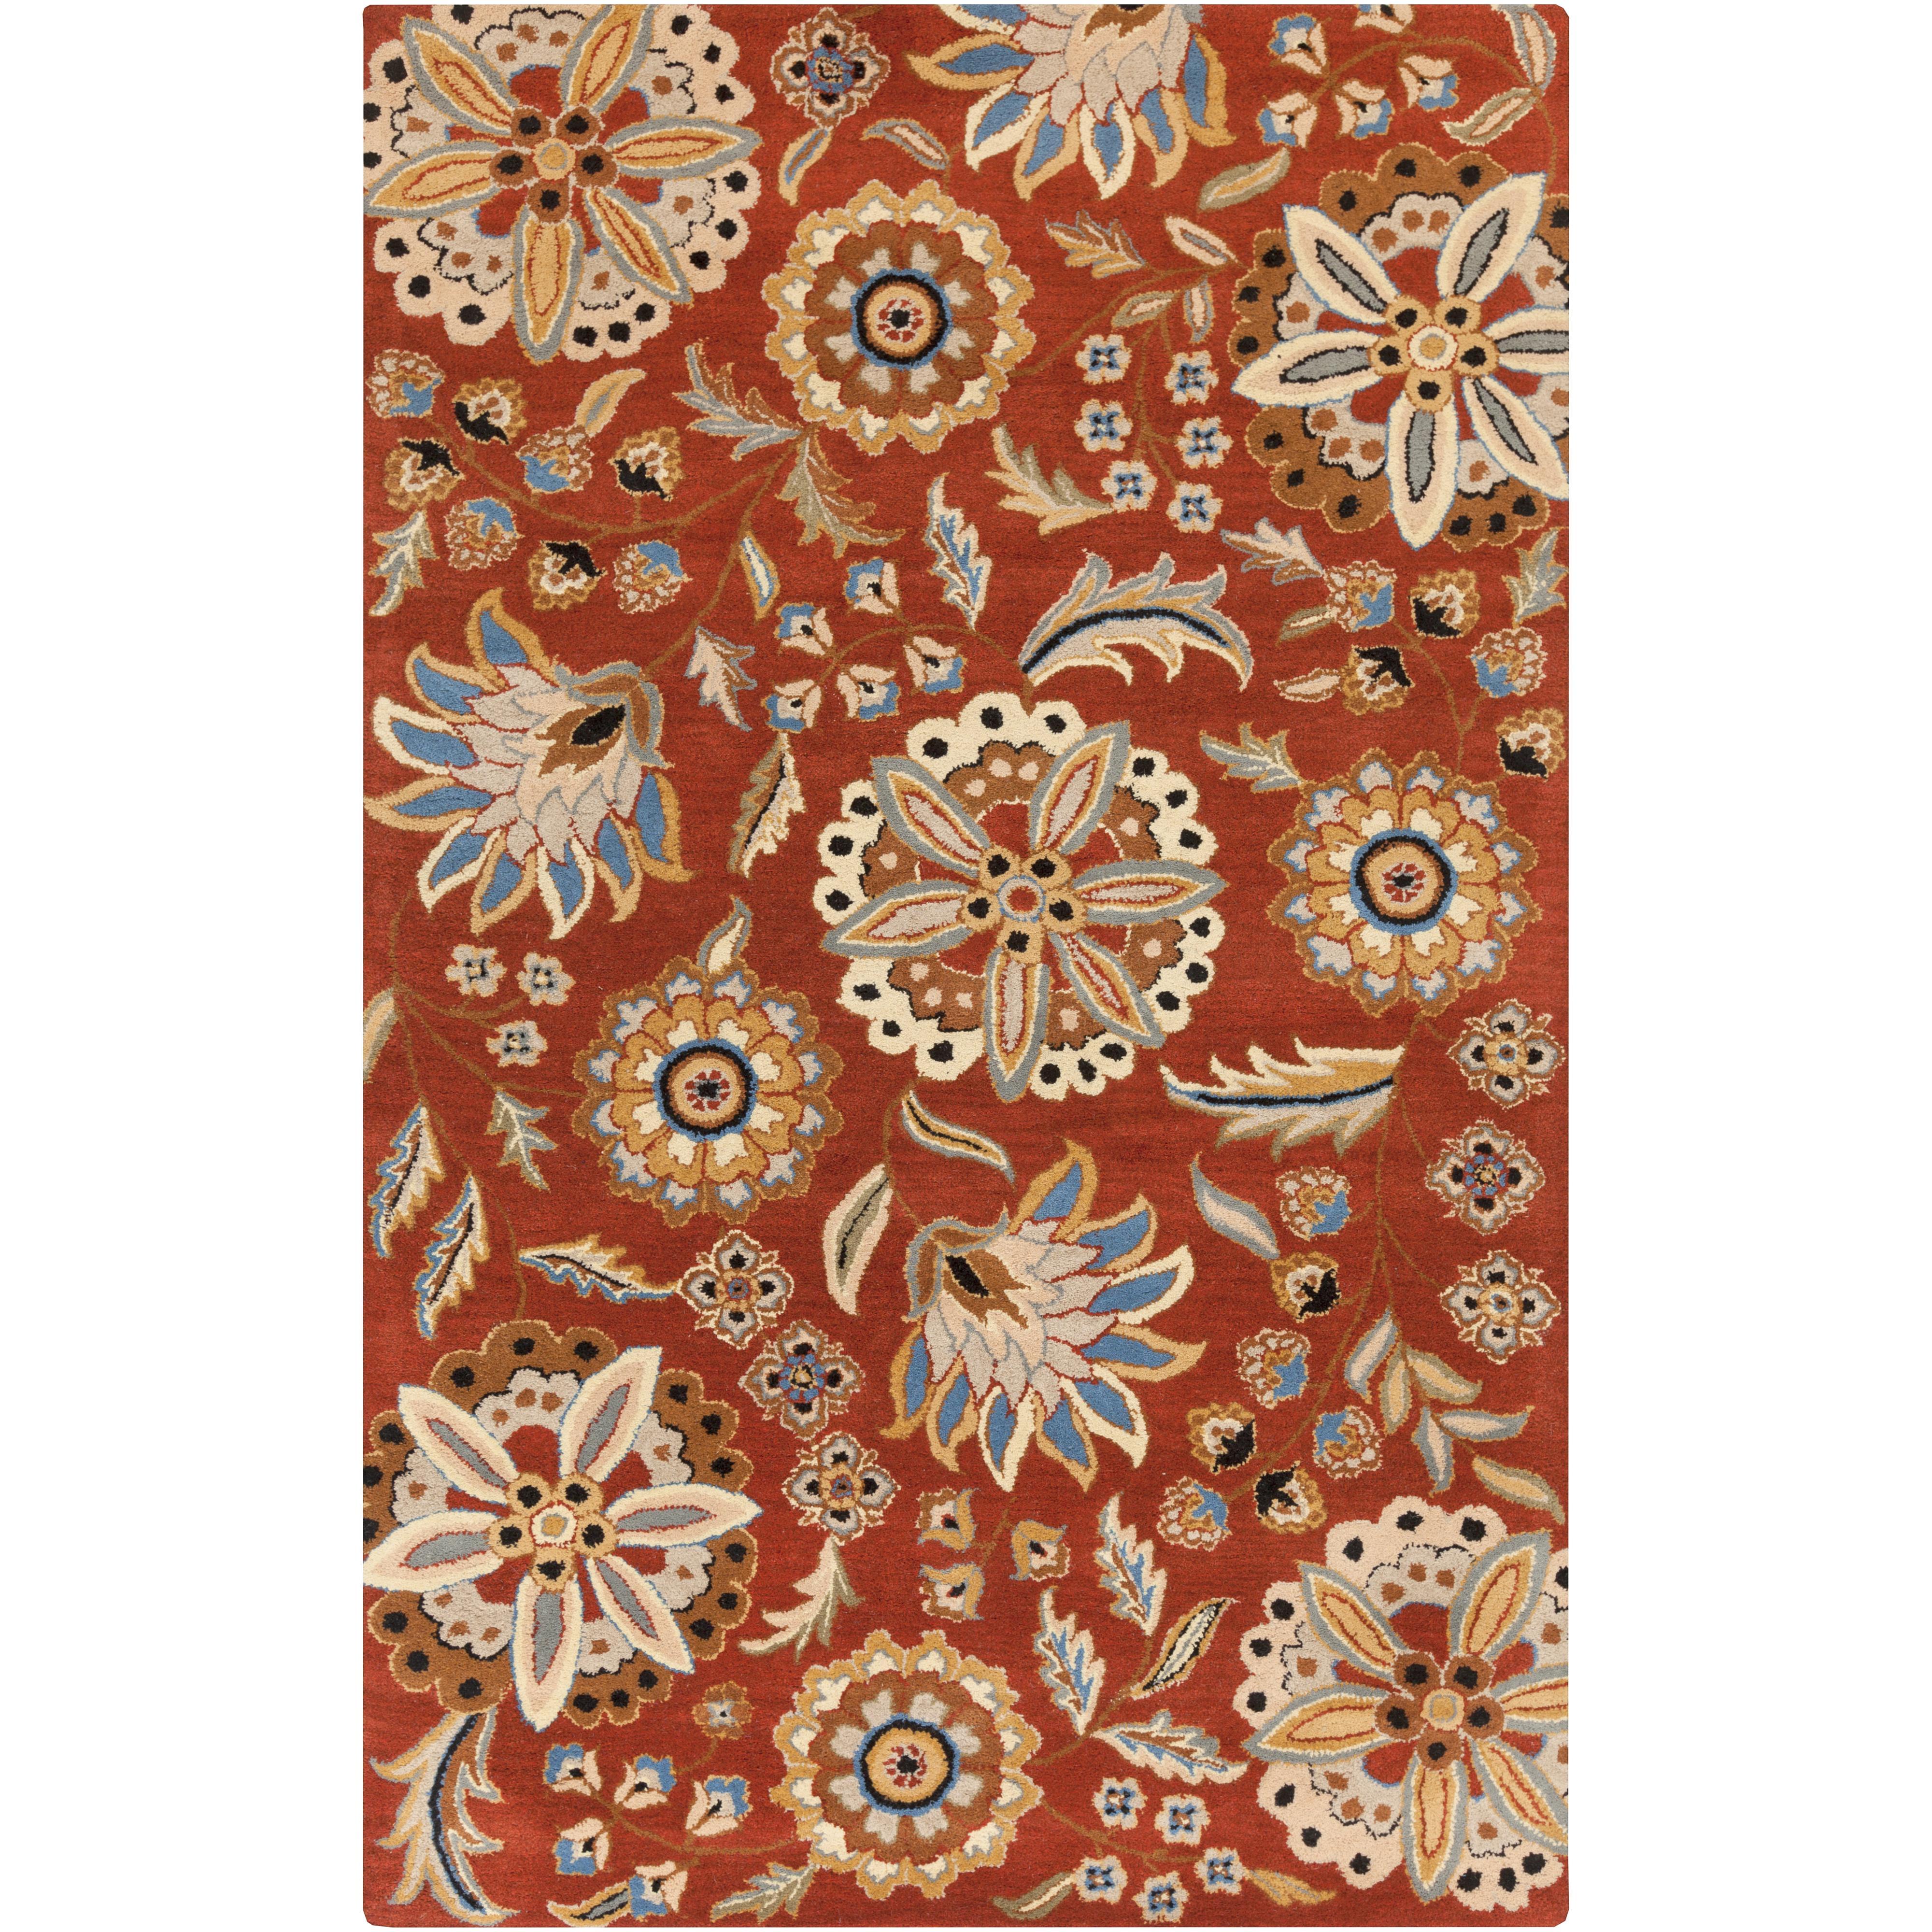 Surya Rugs Athena 5' x 8' - Item Number: ATH5126-58